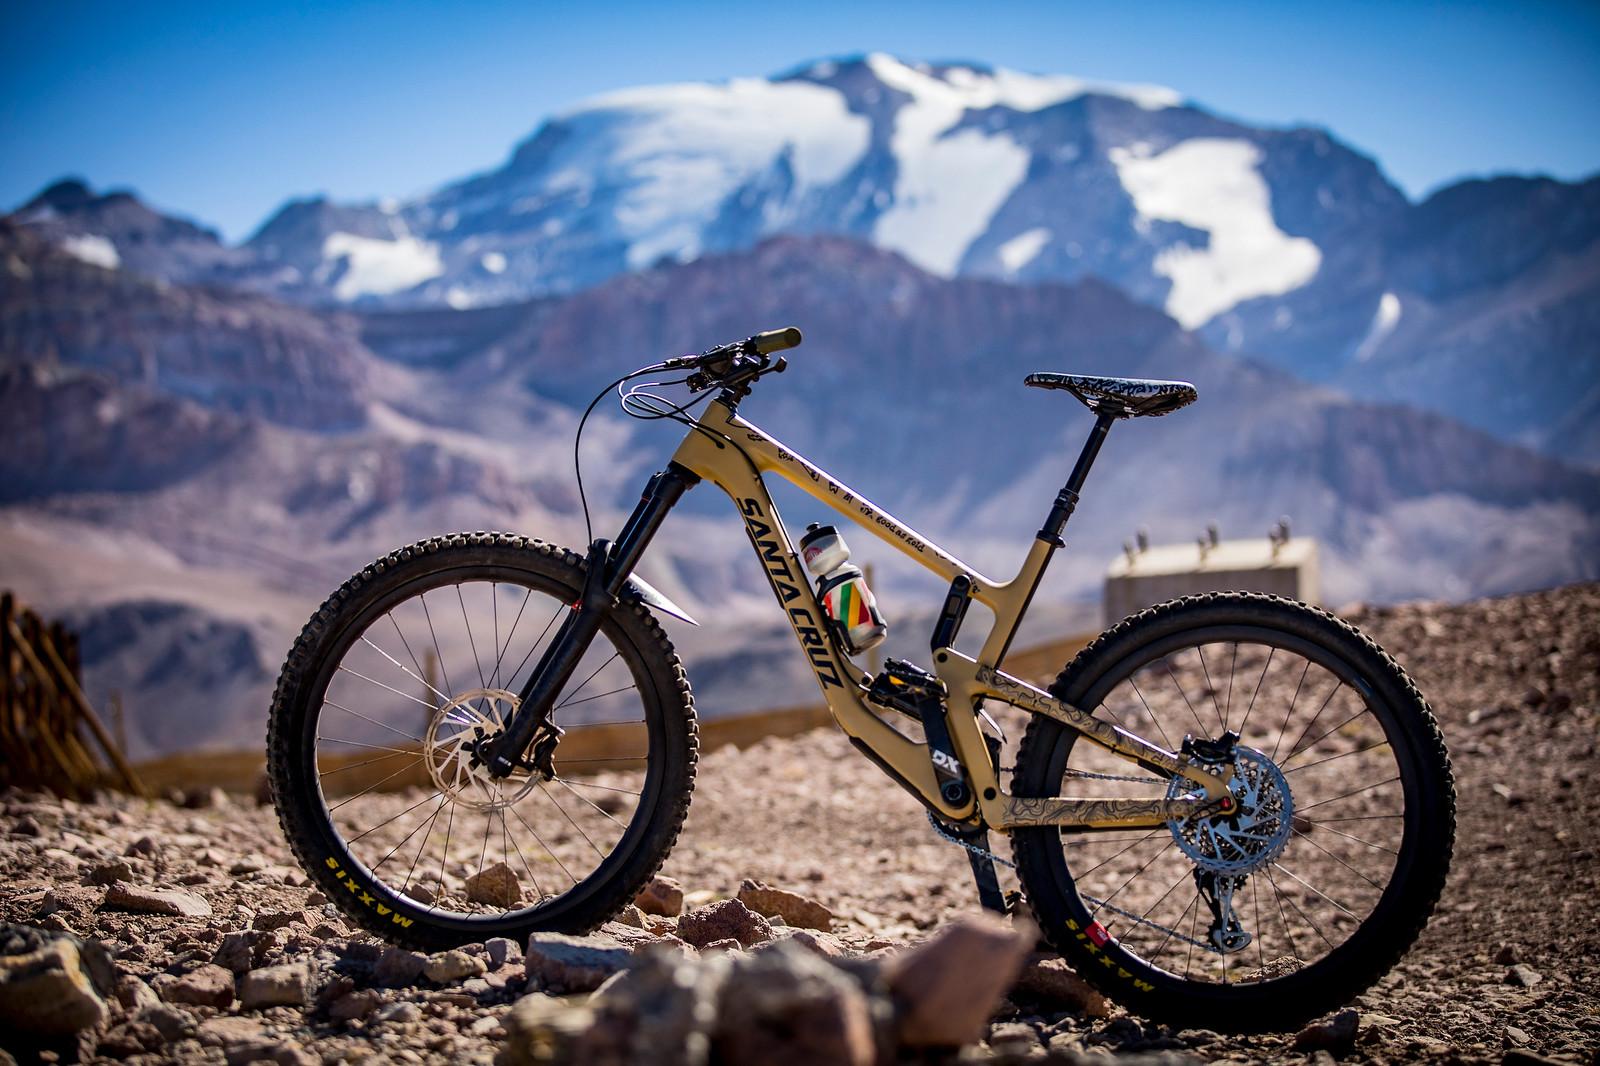 Sven's Santa Cruz Nomad 4 at the 2018 EWS La Parva - PIT BITS AND BIKES - Enduro World Series, Chile - Mountain Biking Pictures - Vital MTB